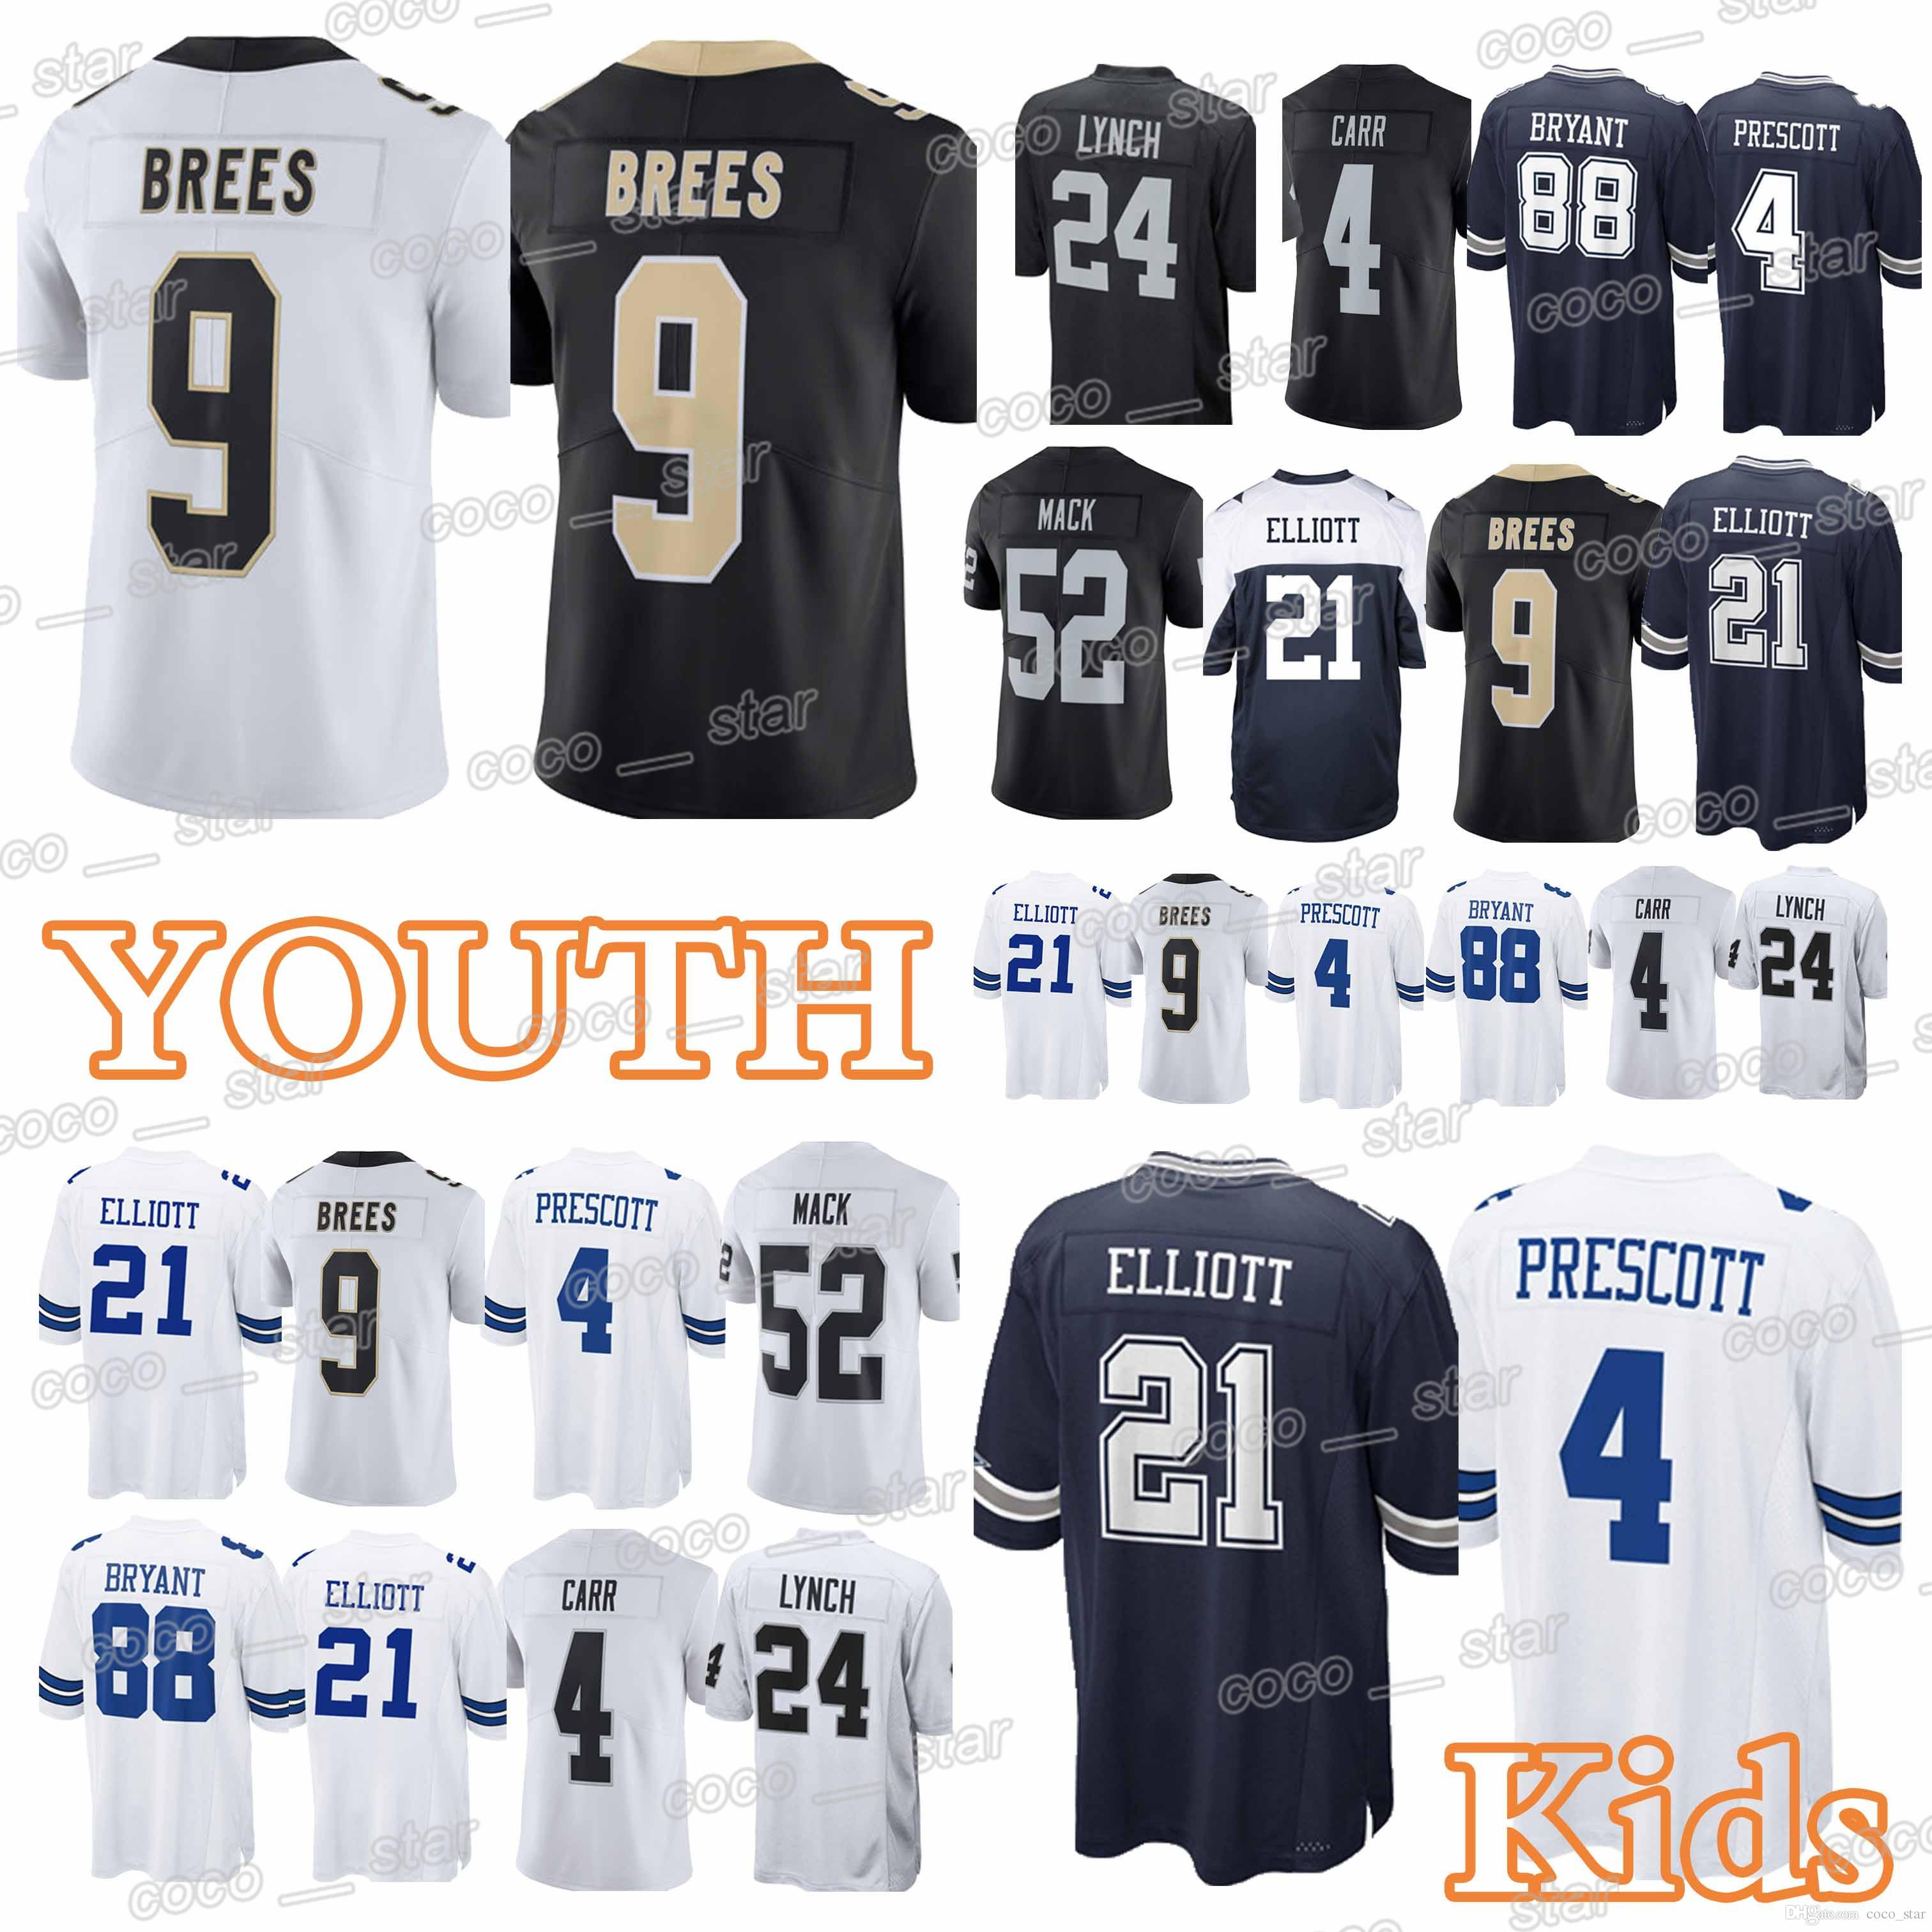 2cffdee25 ... australia 2019 youth new orleans 66 saints dallas 66 cowboys 9 drew  brees jerseys 88 dez